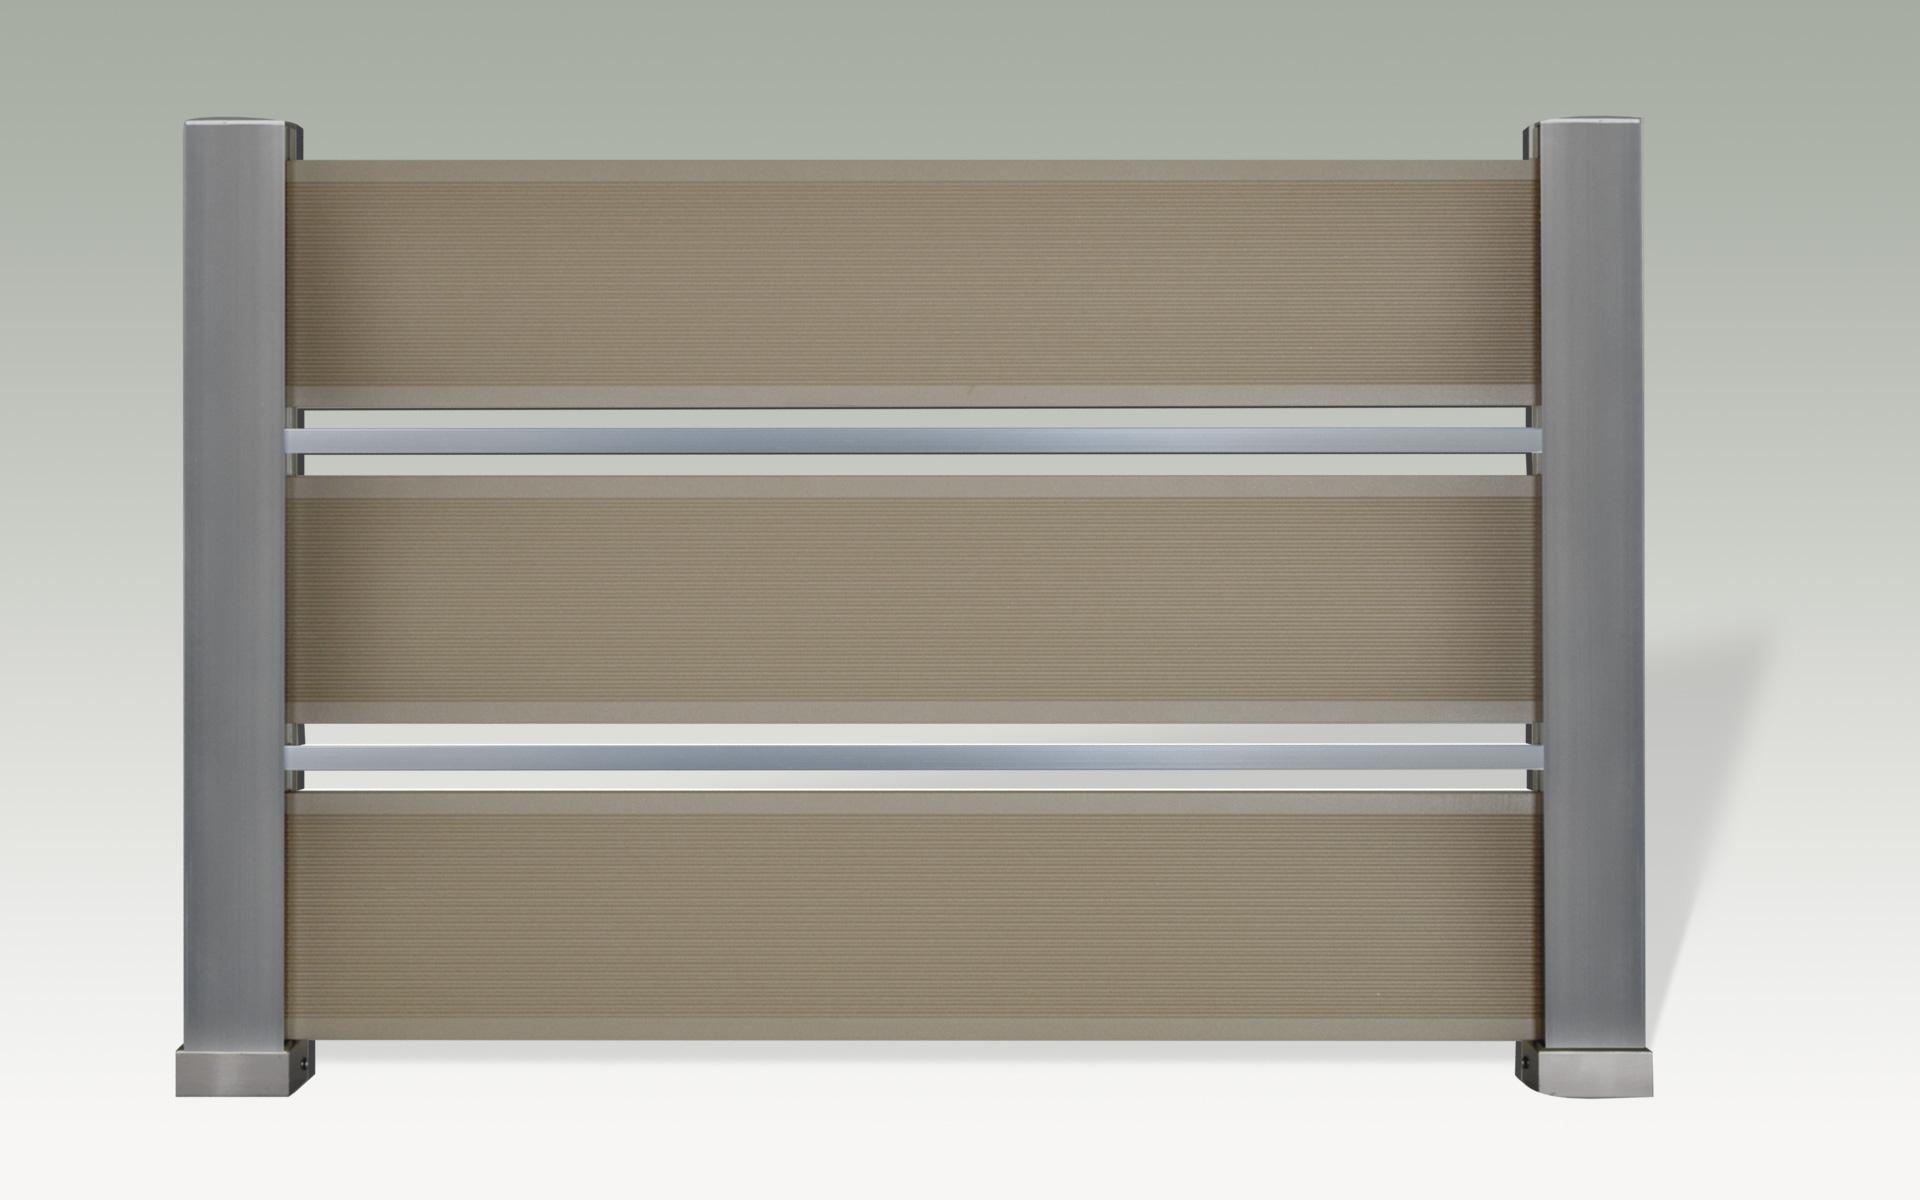 Styledoors perifraxi modern m6492